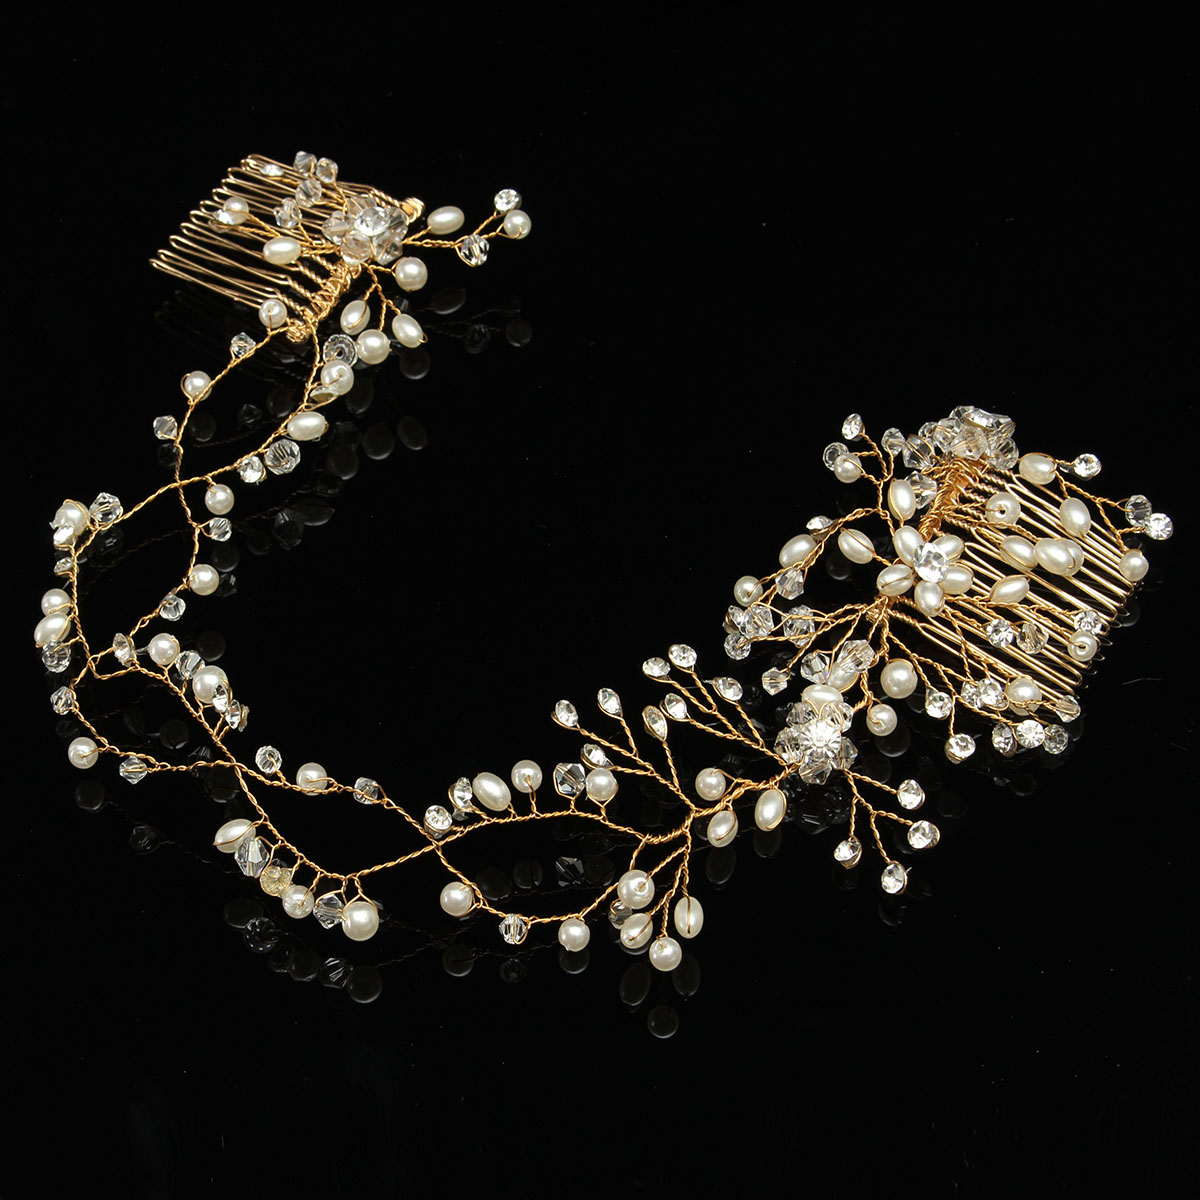 Bride Luxury Crystal Pearl Bead Hair Chain Comb Wedding Bridal Tiara Hair Accessories Headbrand